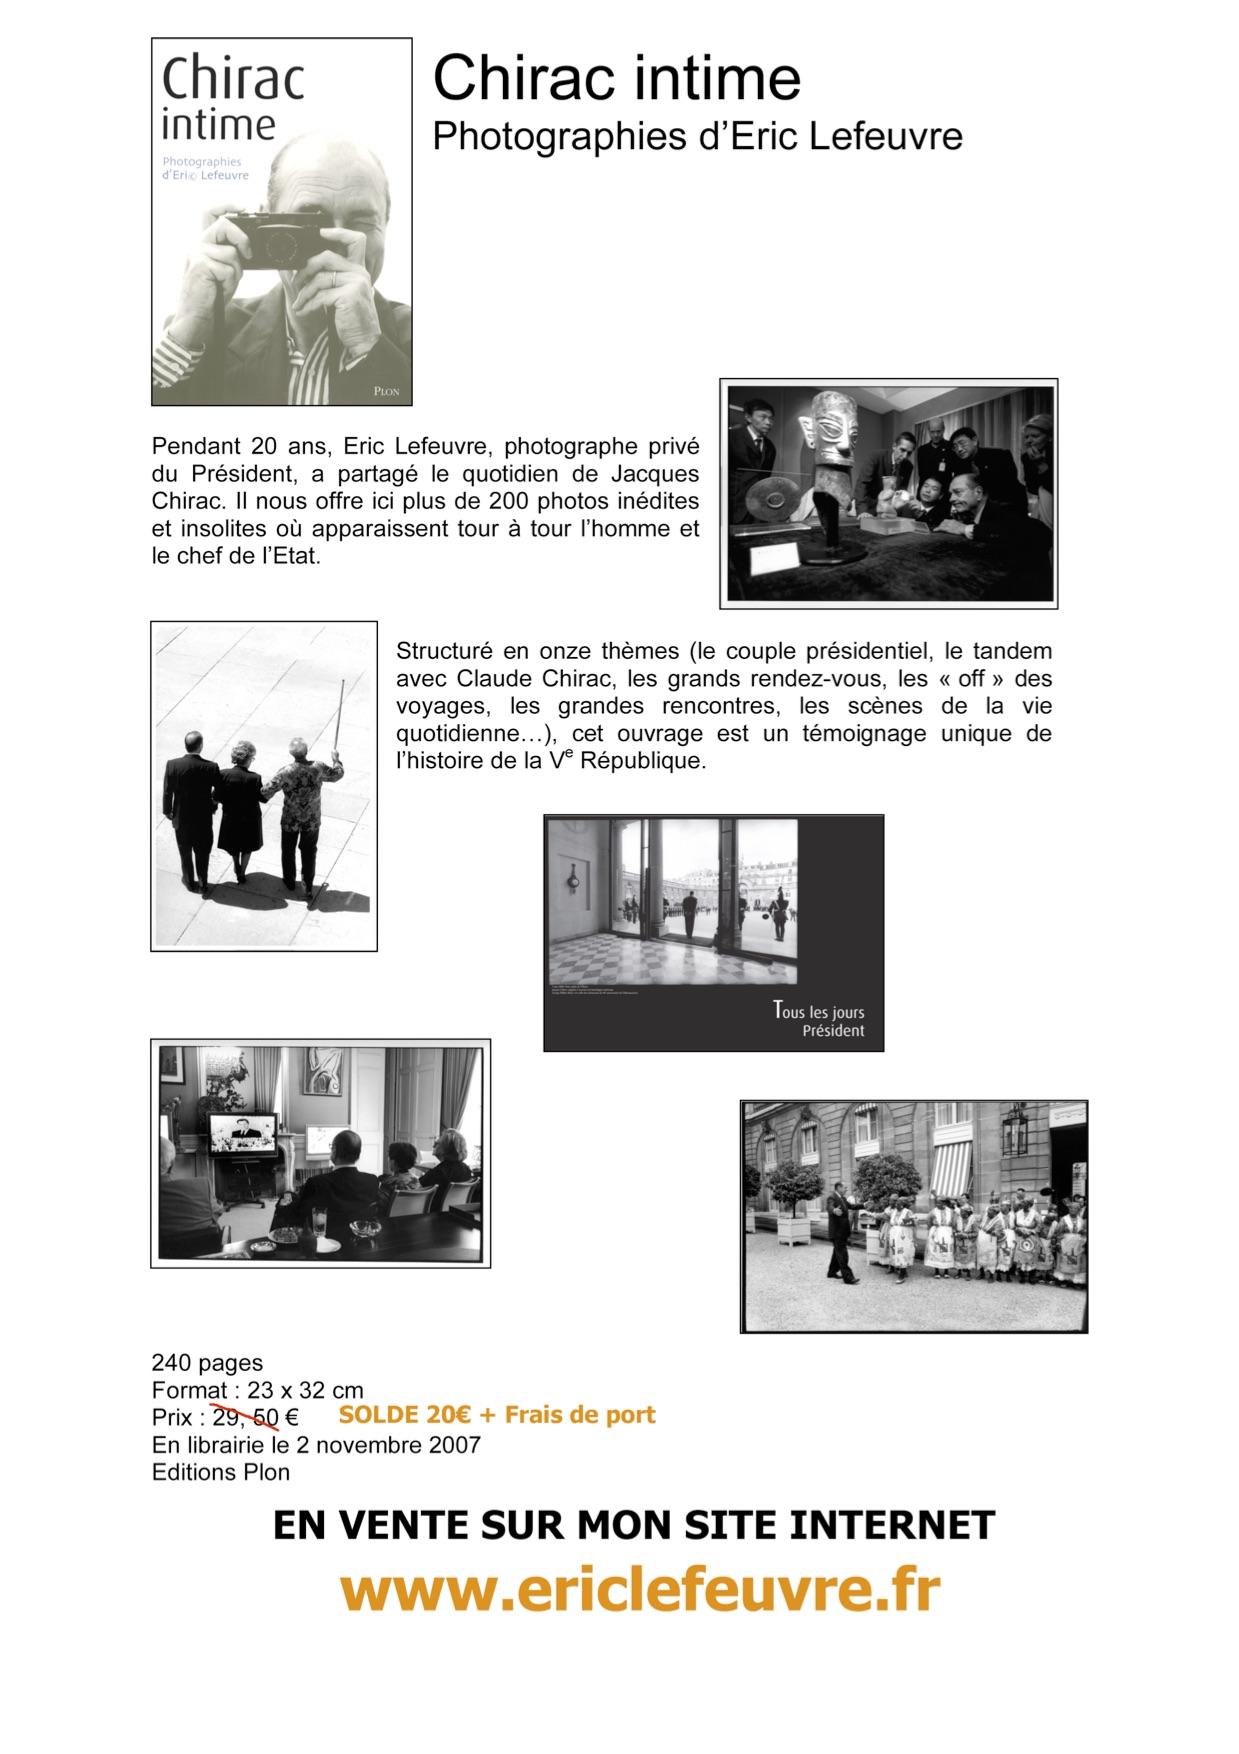 Chirac intime_fiche_present_solde.psd